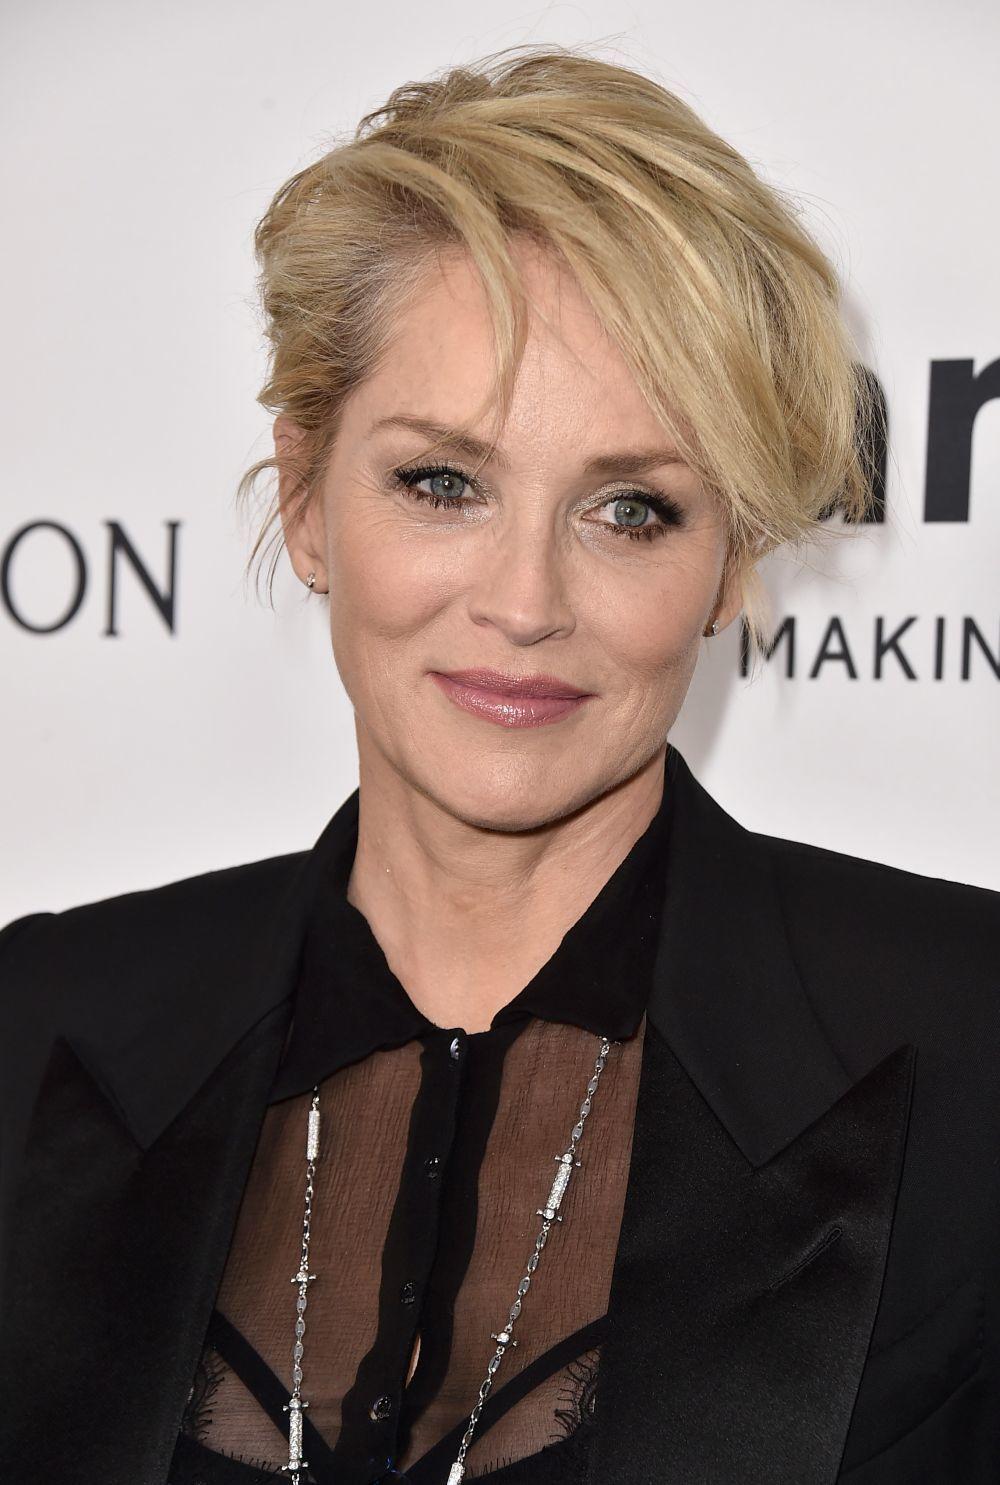 Sharon Stone con su corte pixie asimétrico.